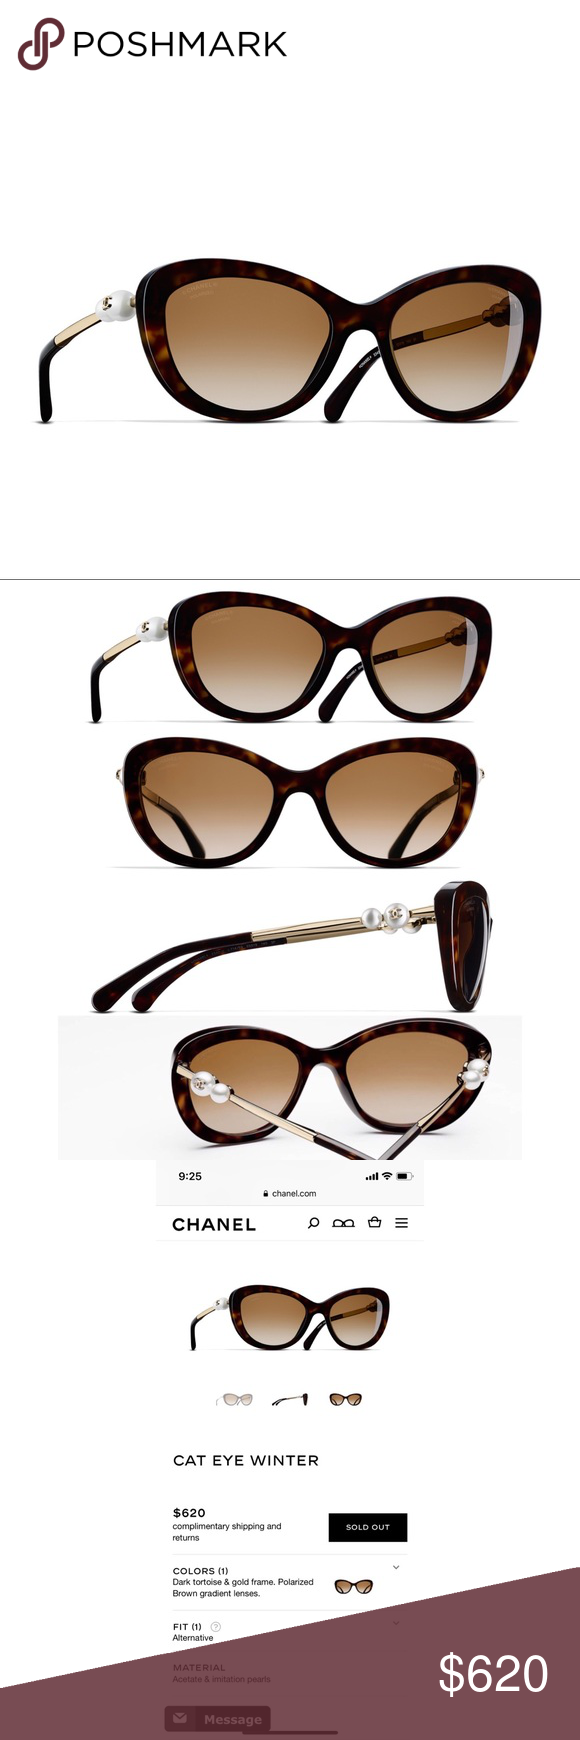 d2b48343dd Chanel cat eye winter sunglasses Brand new Chanel sunglasses. Selling  because I didn t